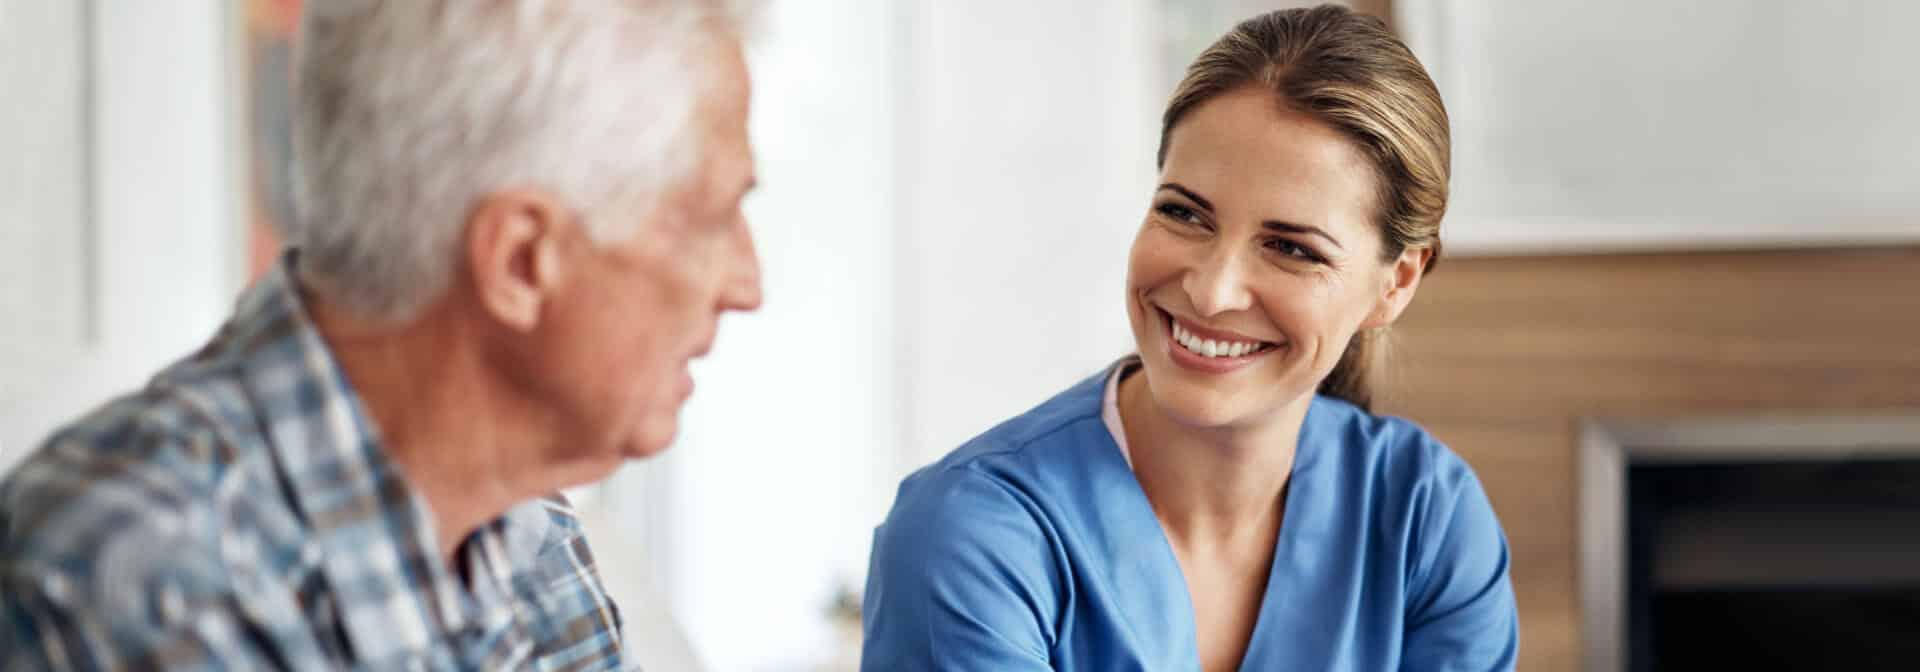 Caregiver talking a client